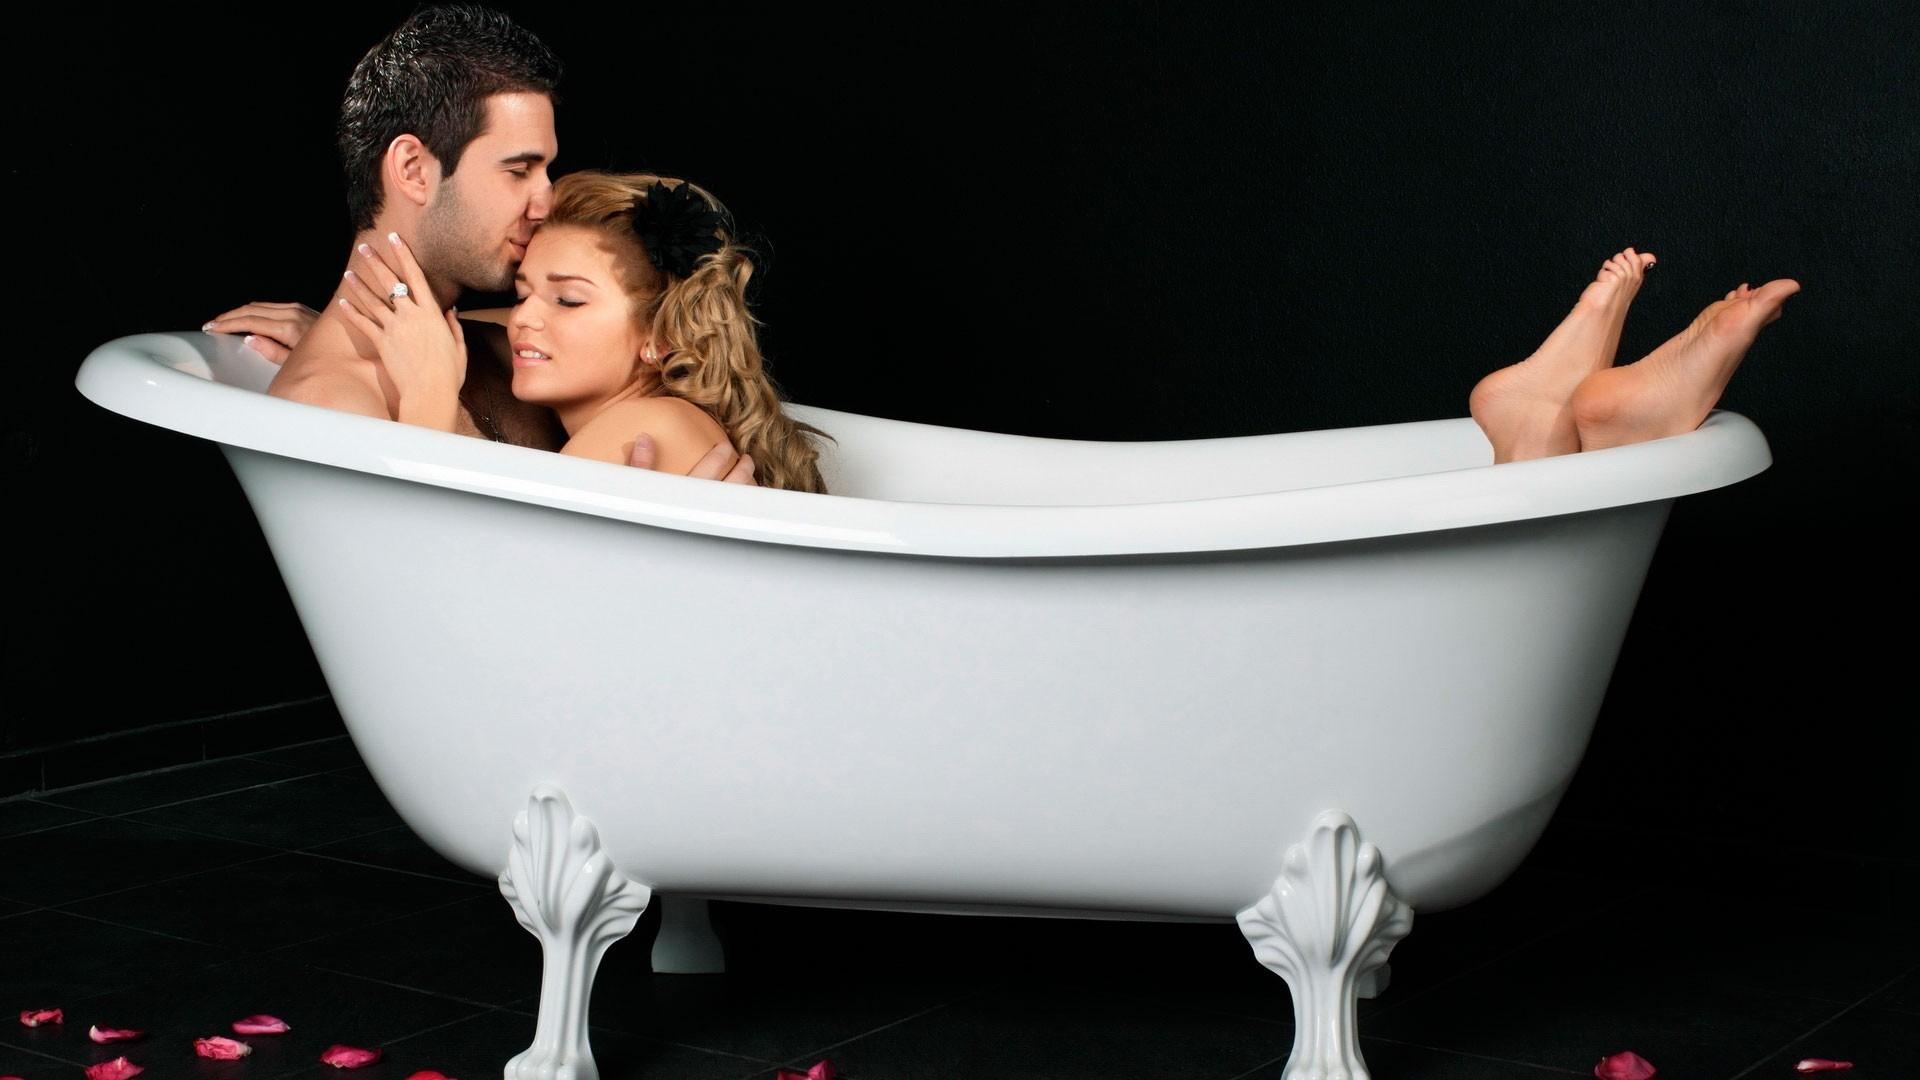 Anastasia lux - 387 videos - iWank TV  Other free porn